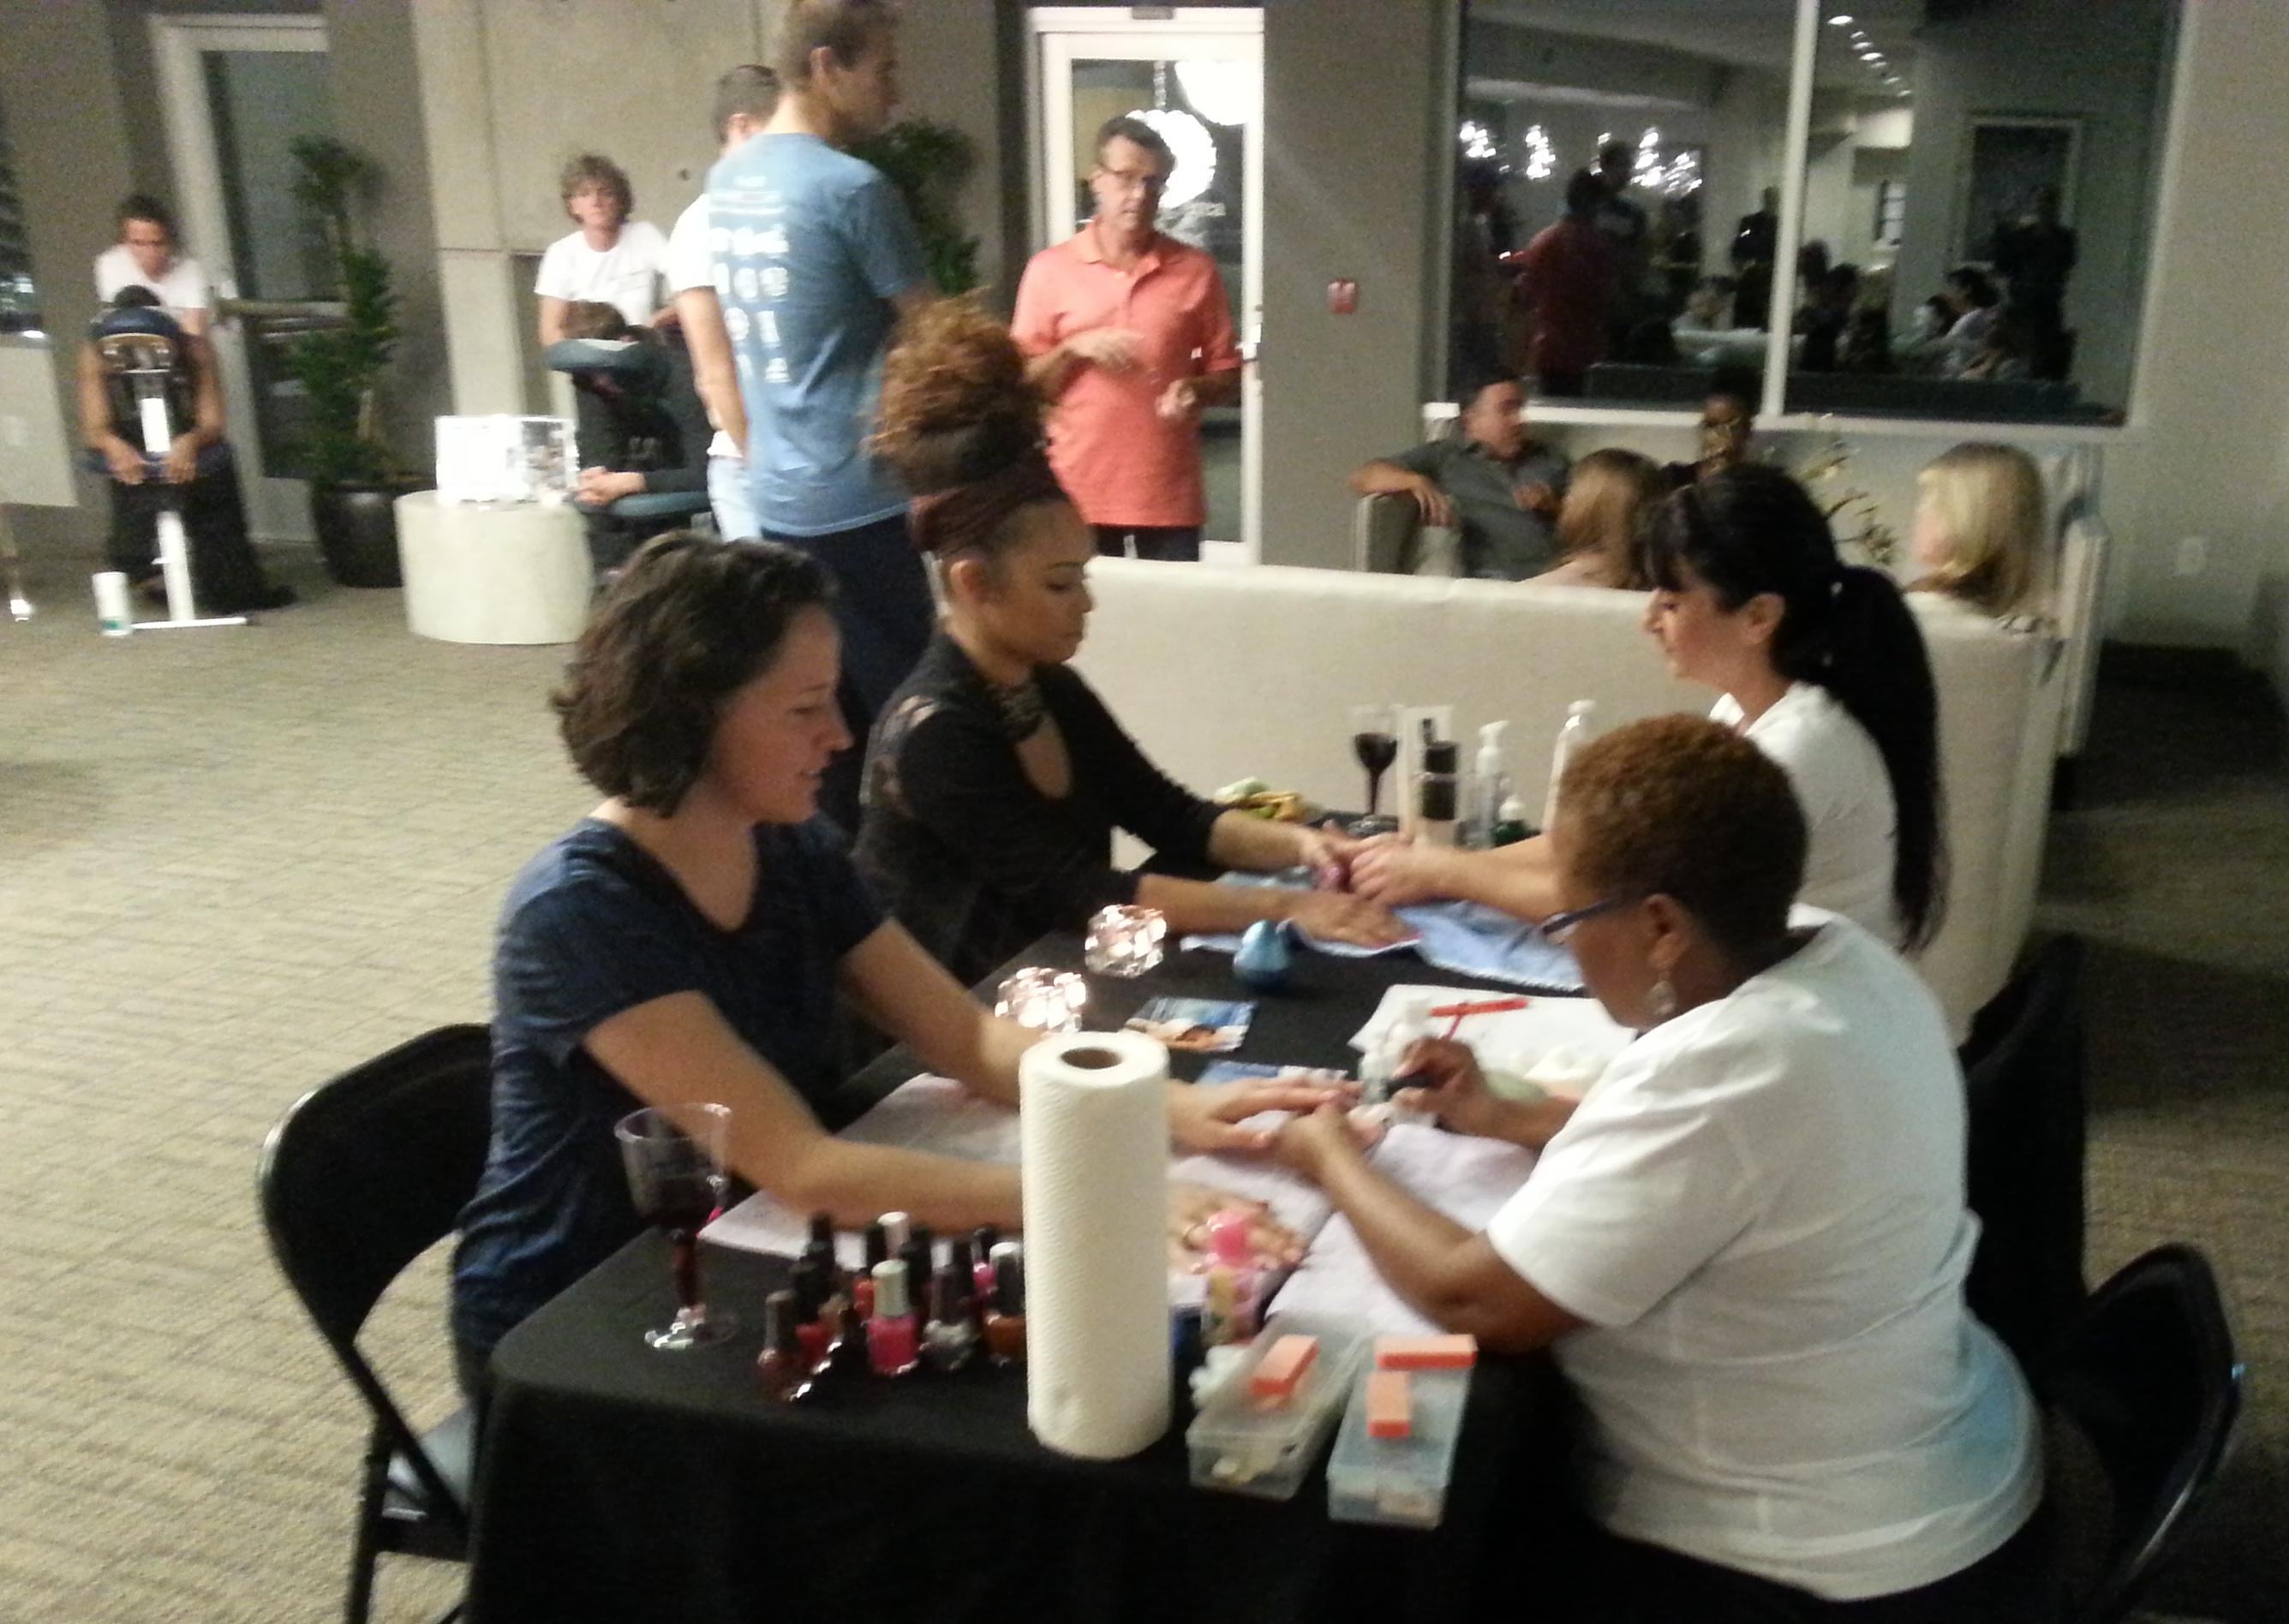 mobile spa parties in atlanta birthdays office parties special atlanta spa parties by turn 2 massage